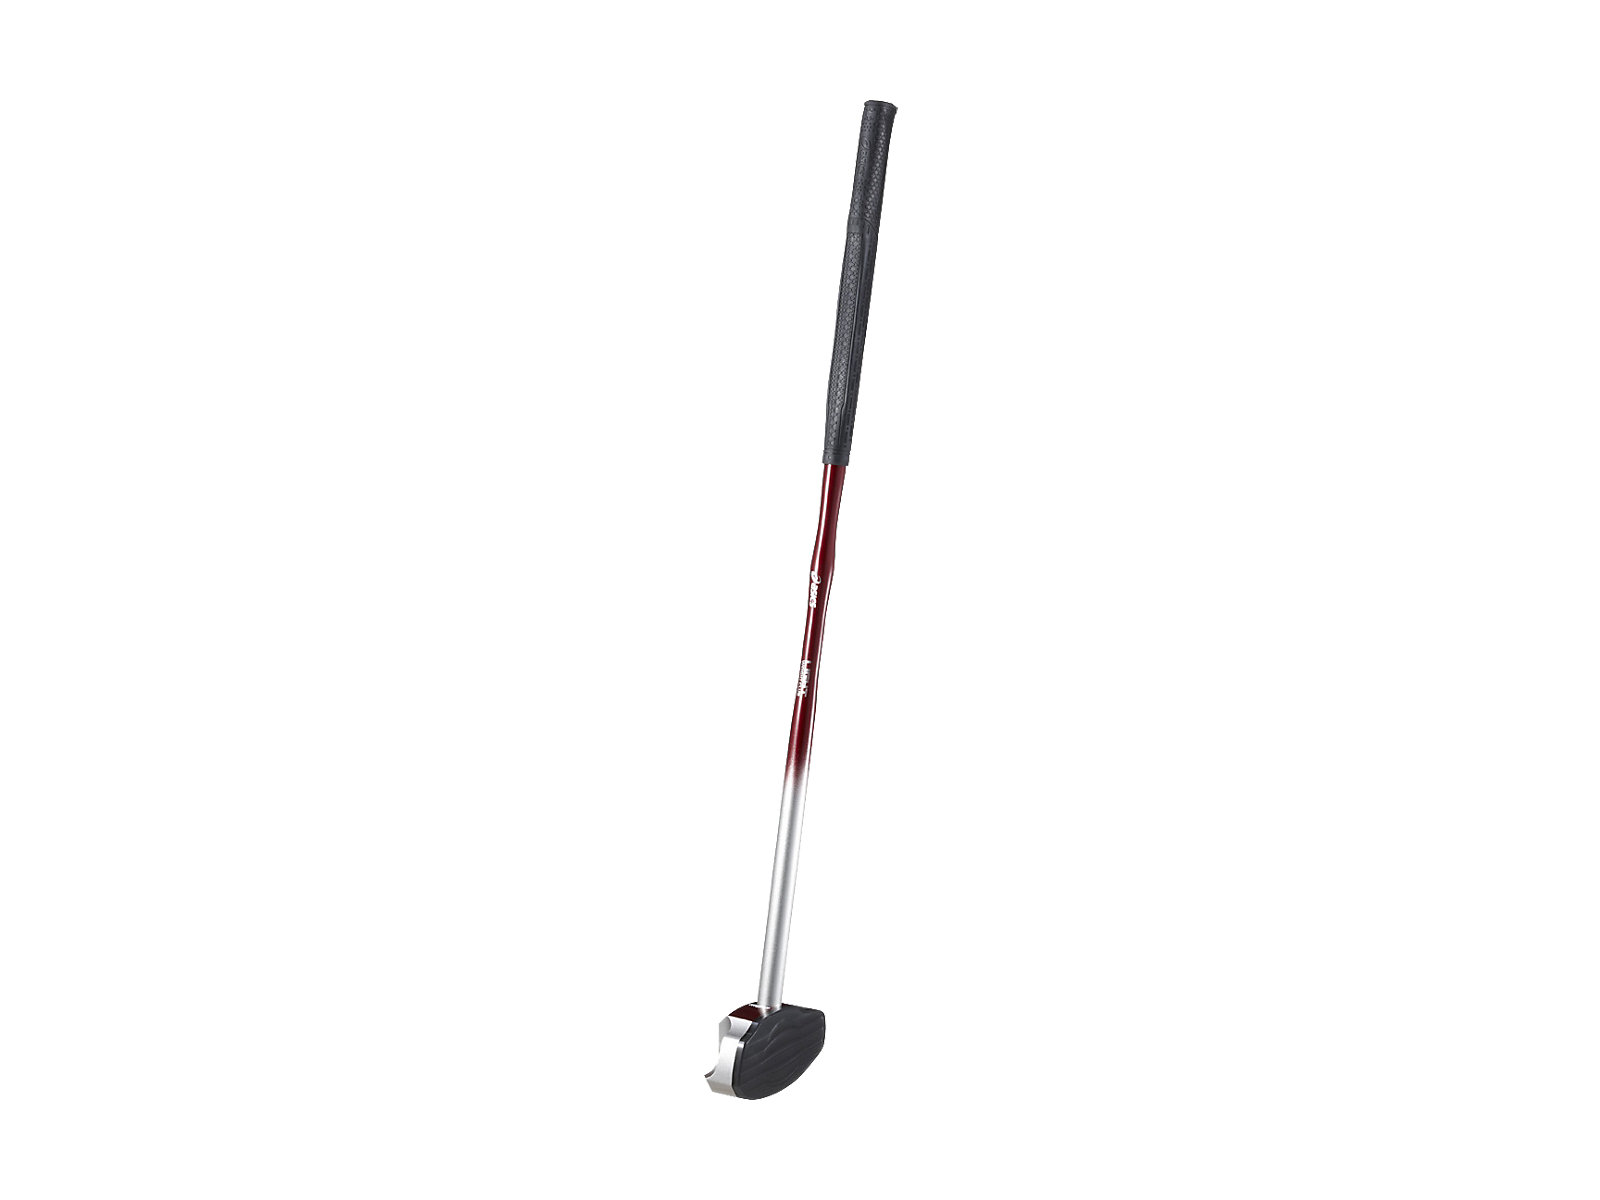 asics(アシックス) グラウンドゴルフ クラブ ライトウエイトクラブ(一般左打者専用) メンズ・レディース GGG189